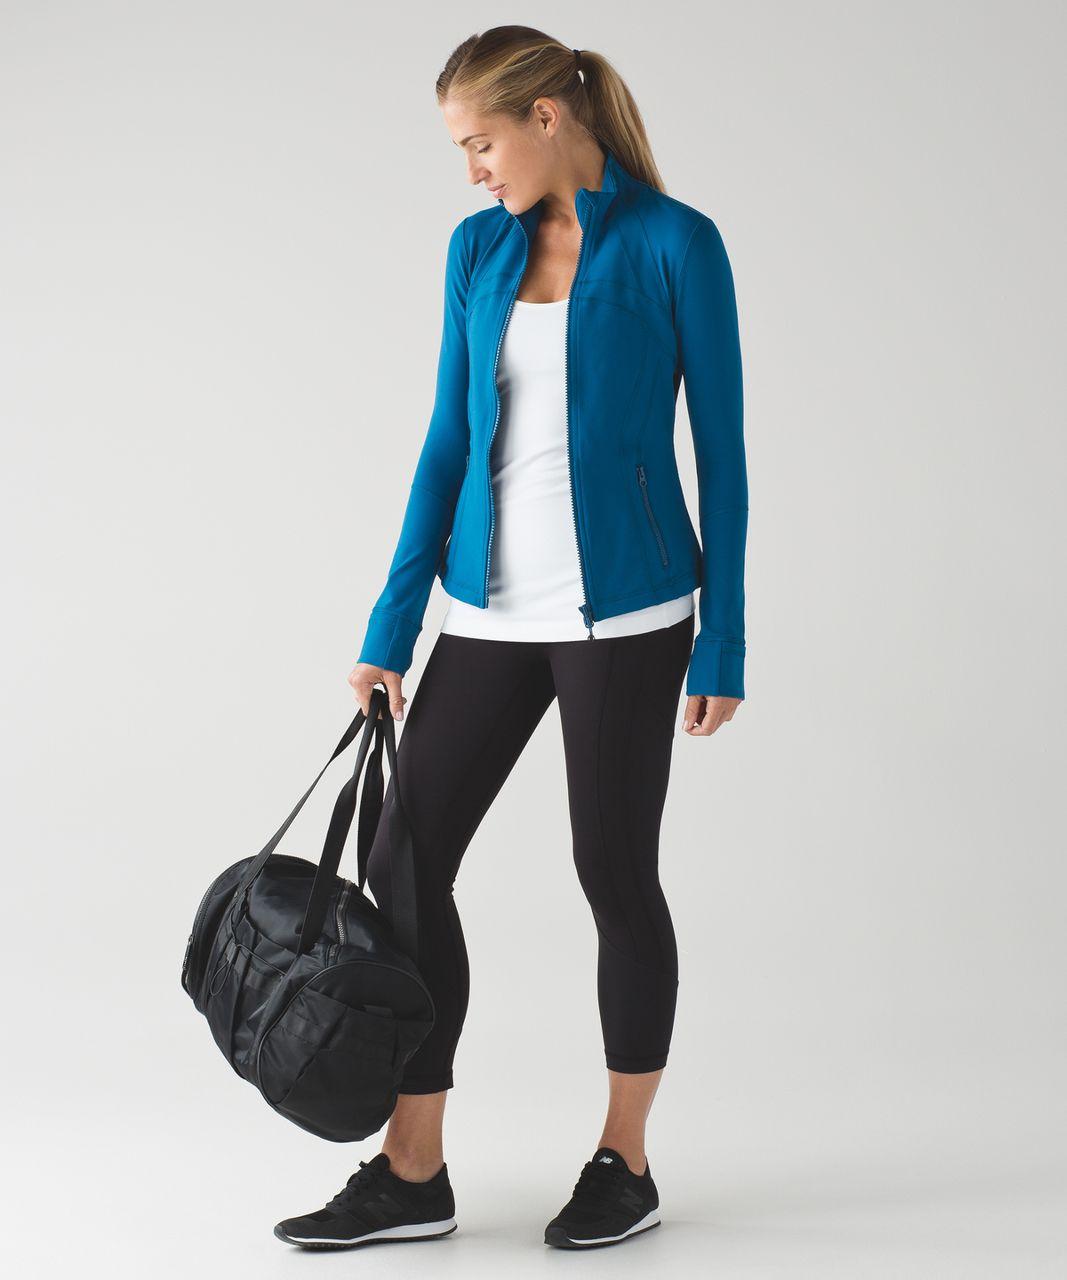 Lululemon Define Jacket - Jet Set Blue